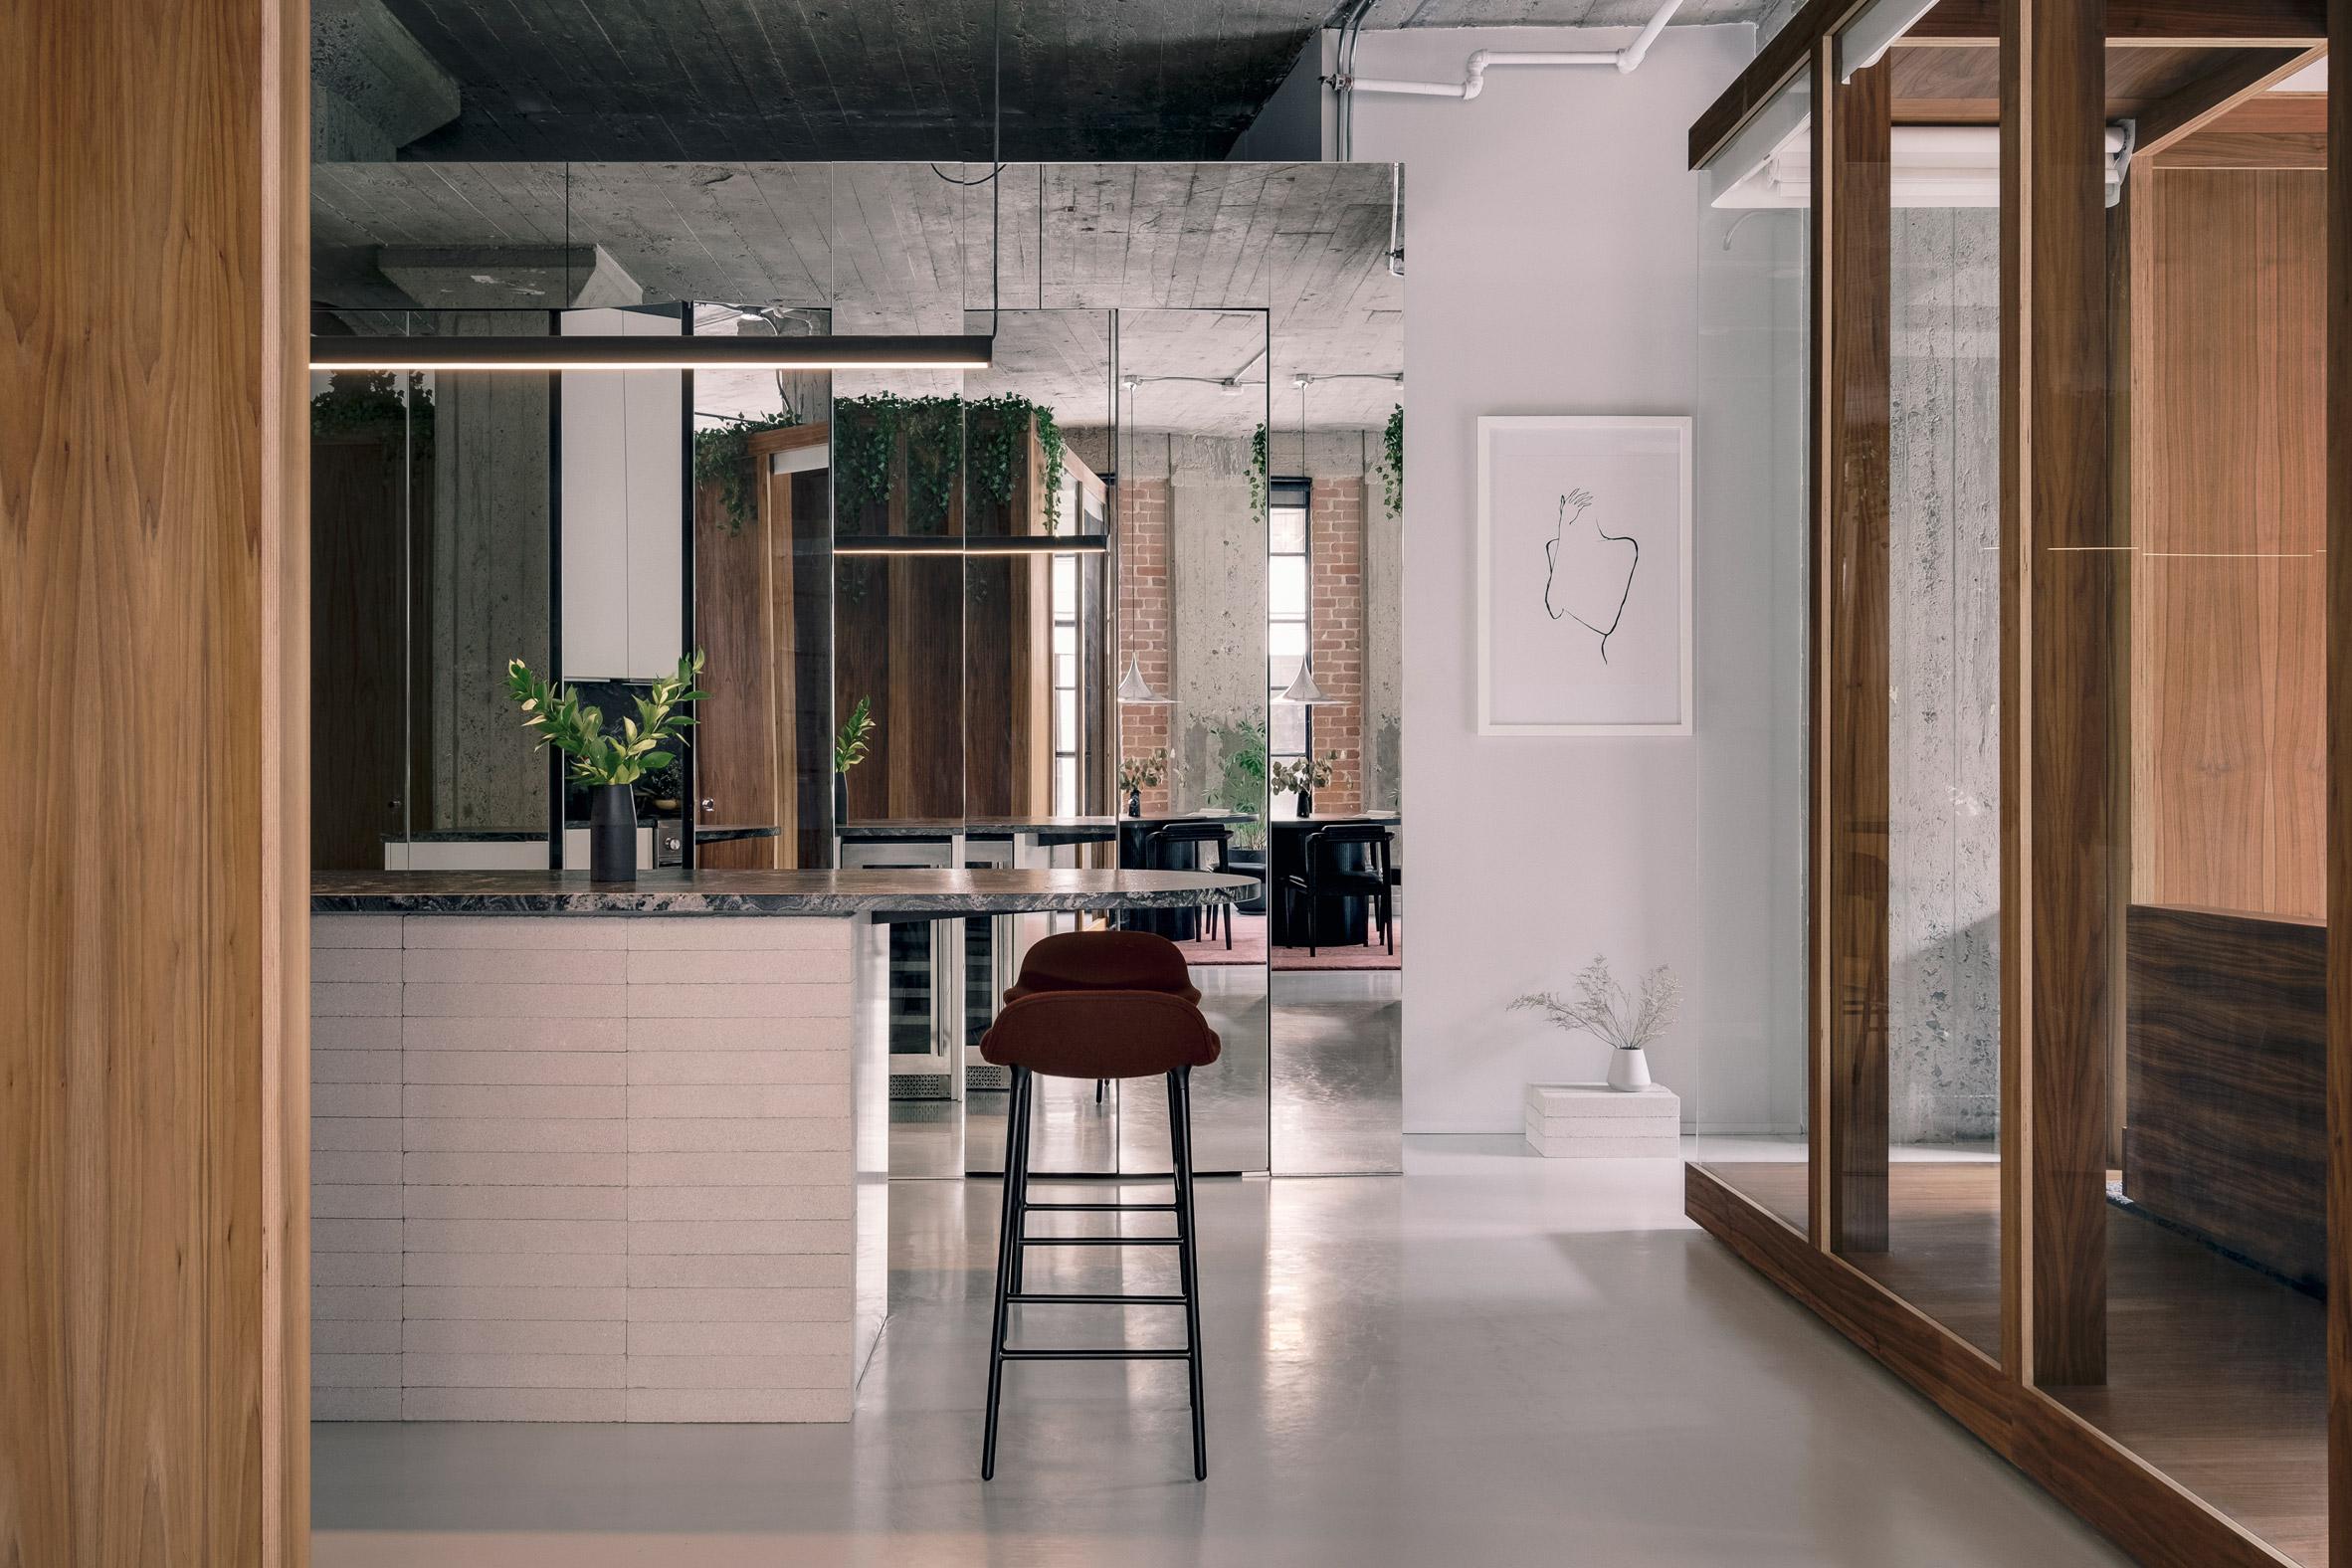 Future Simple Studio designed Rue de la Gauchetière